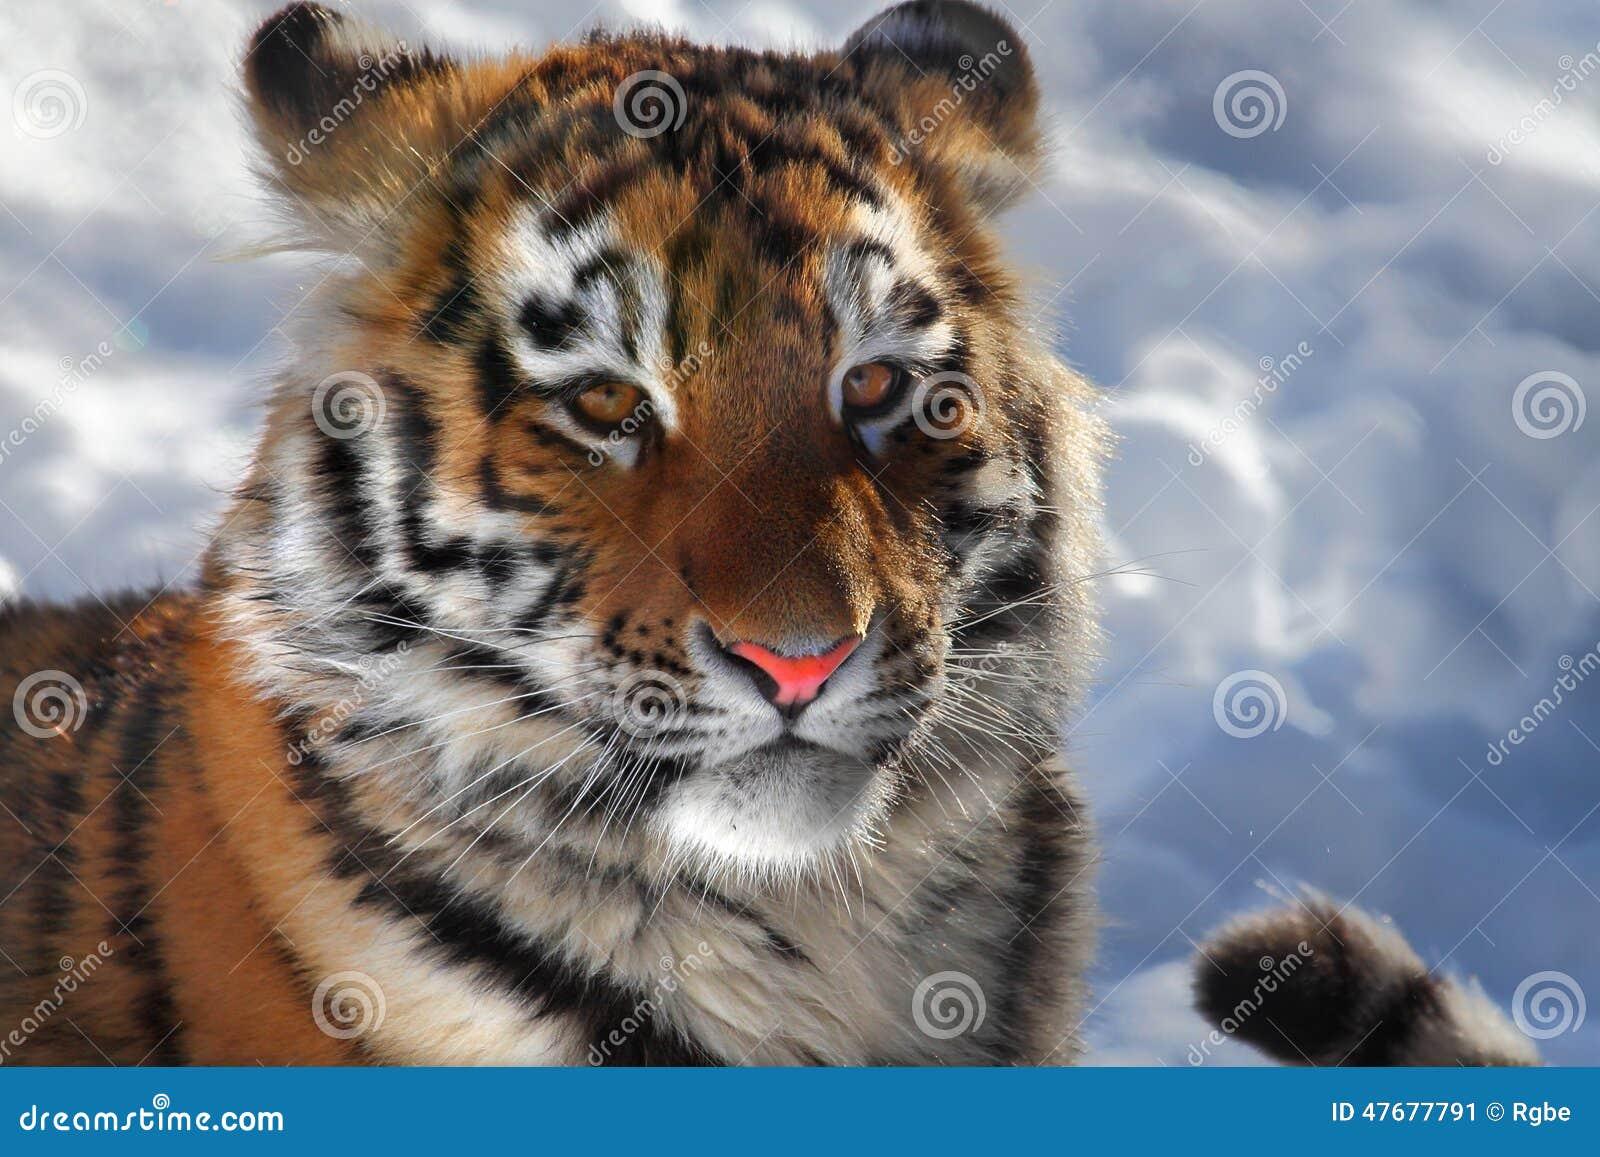 Baby tiger portrait